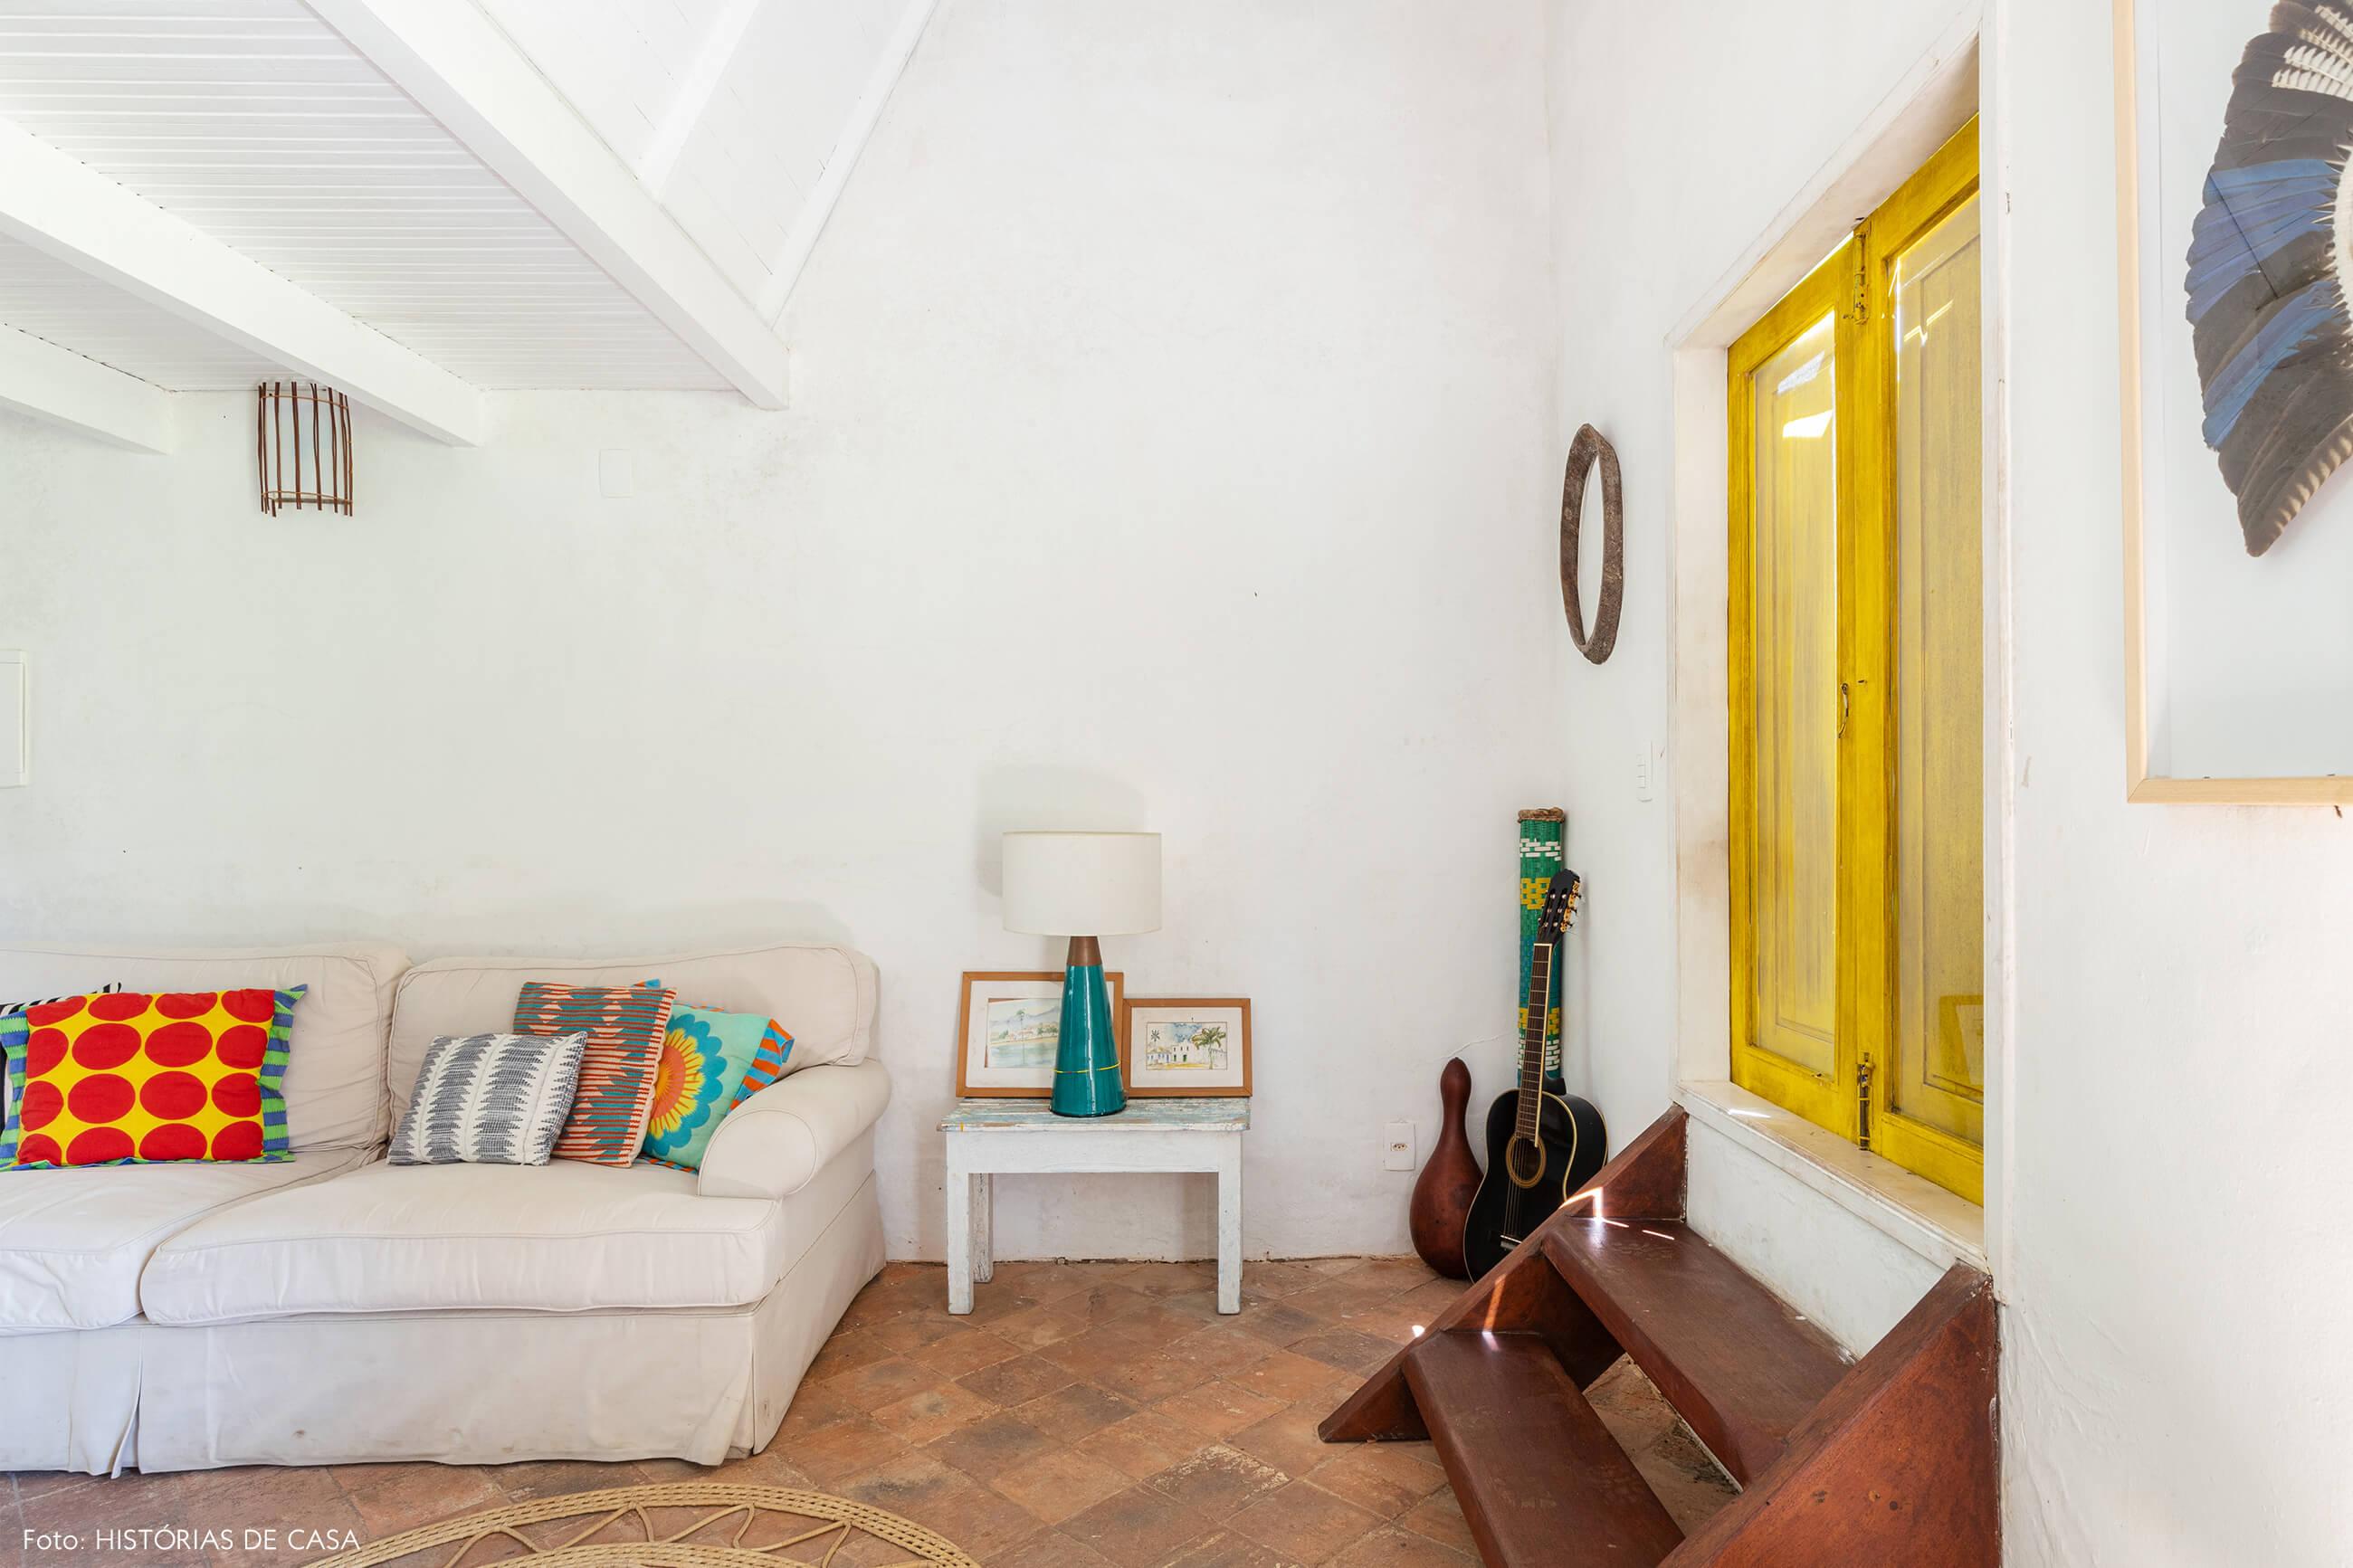 flavia-decoração-trancoso-sala-branca-com-janela-amarel